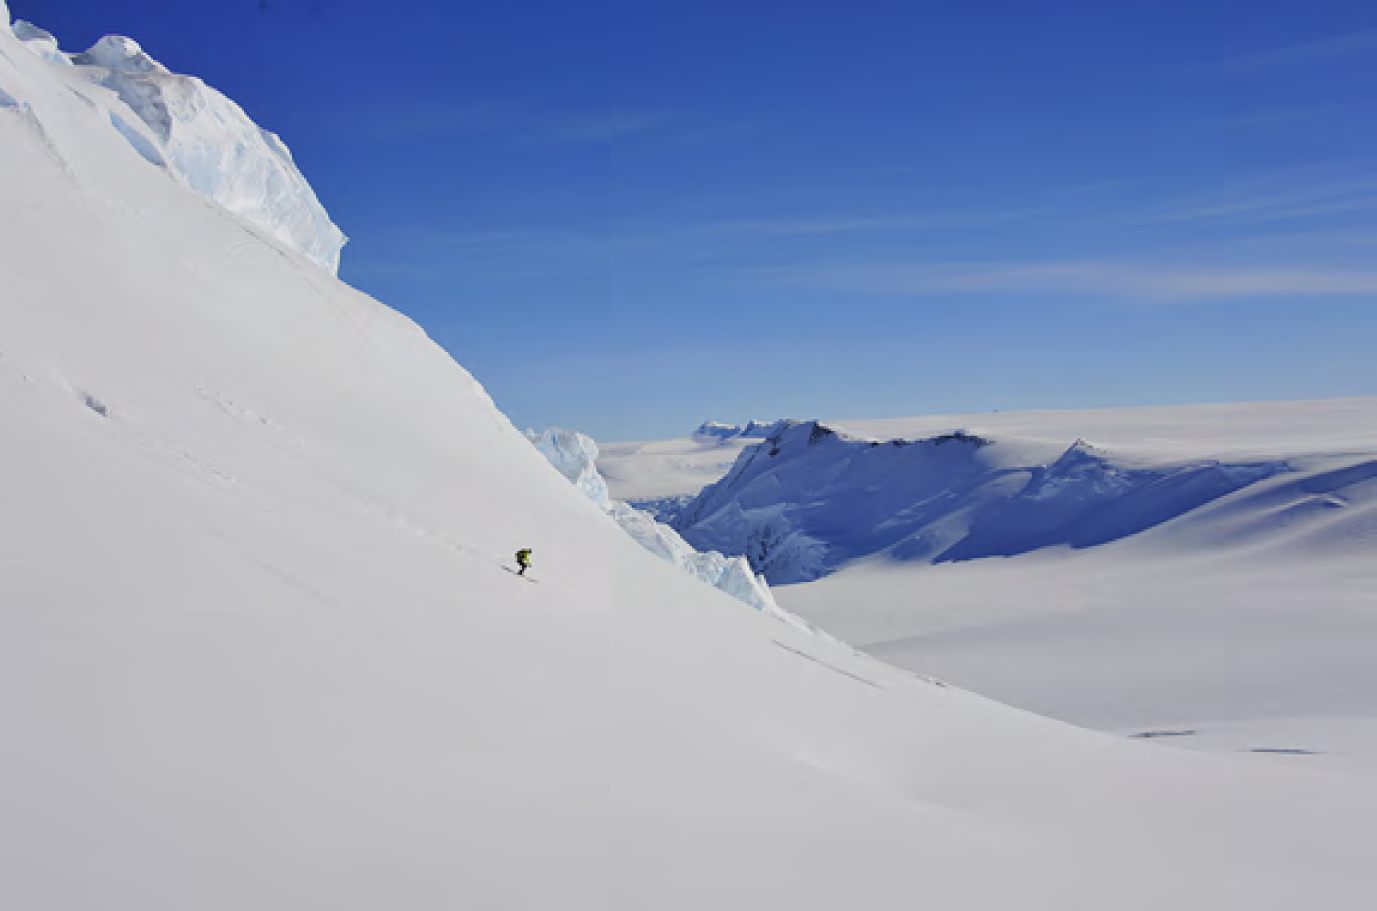 Seth Waterfall Skis Antarctica